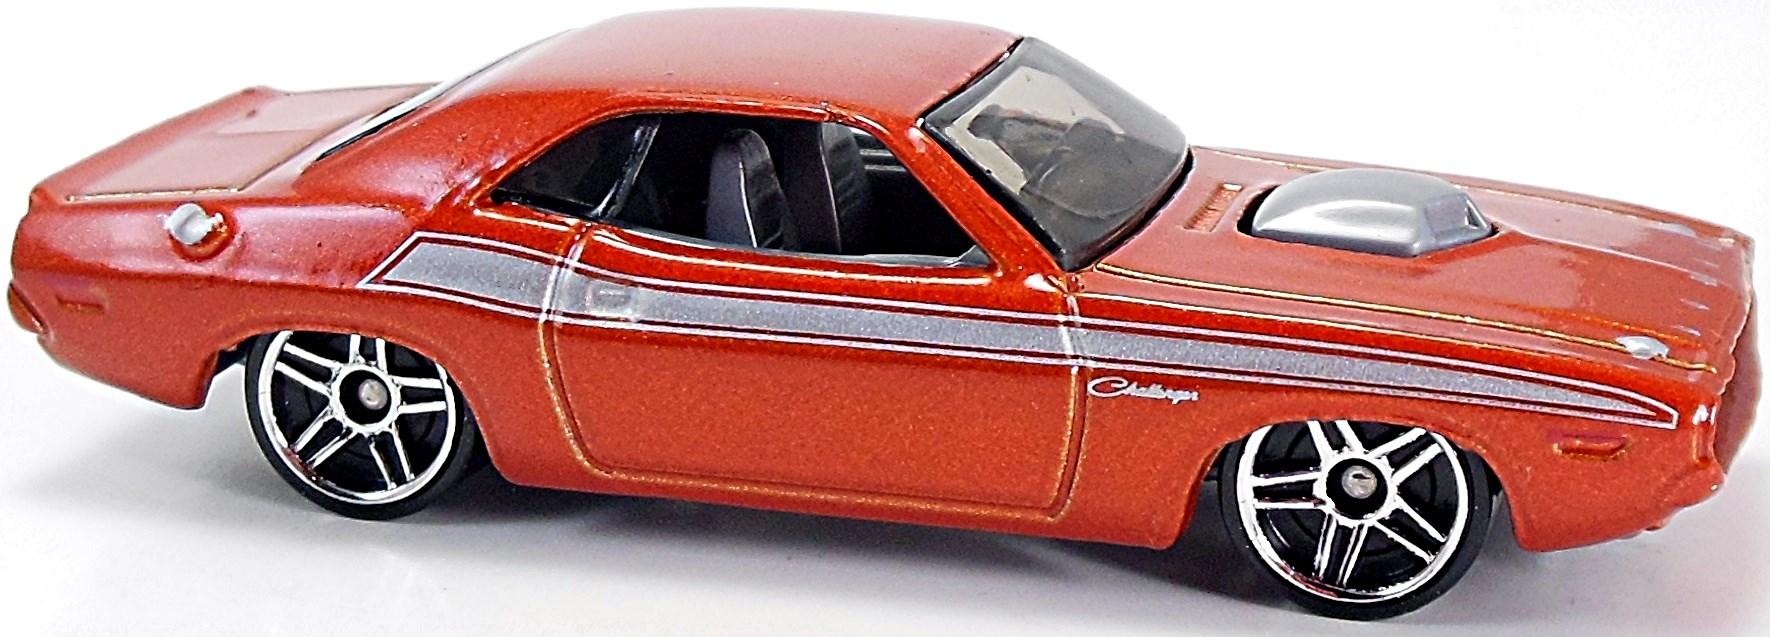 2018 Hot Wheels #189 Muscle Mania /'70 Dodge Hemi Challenger